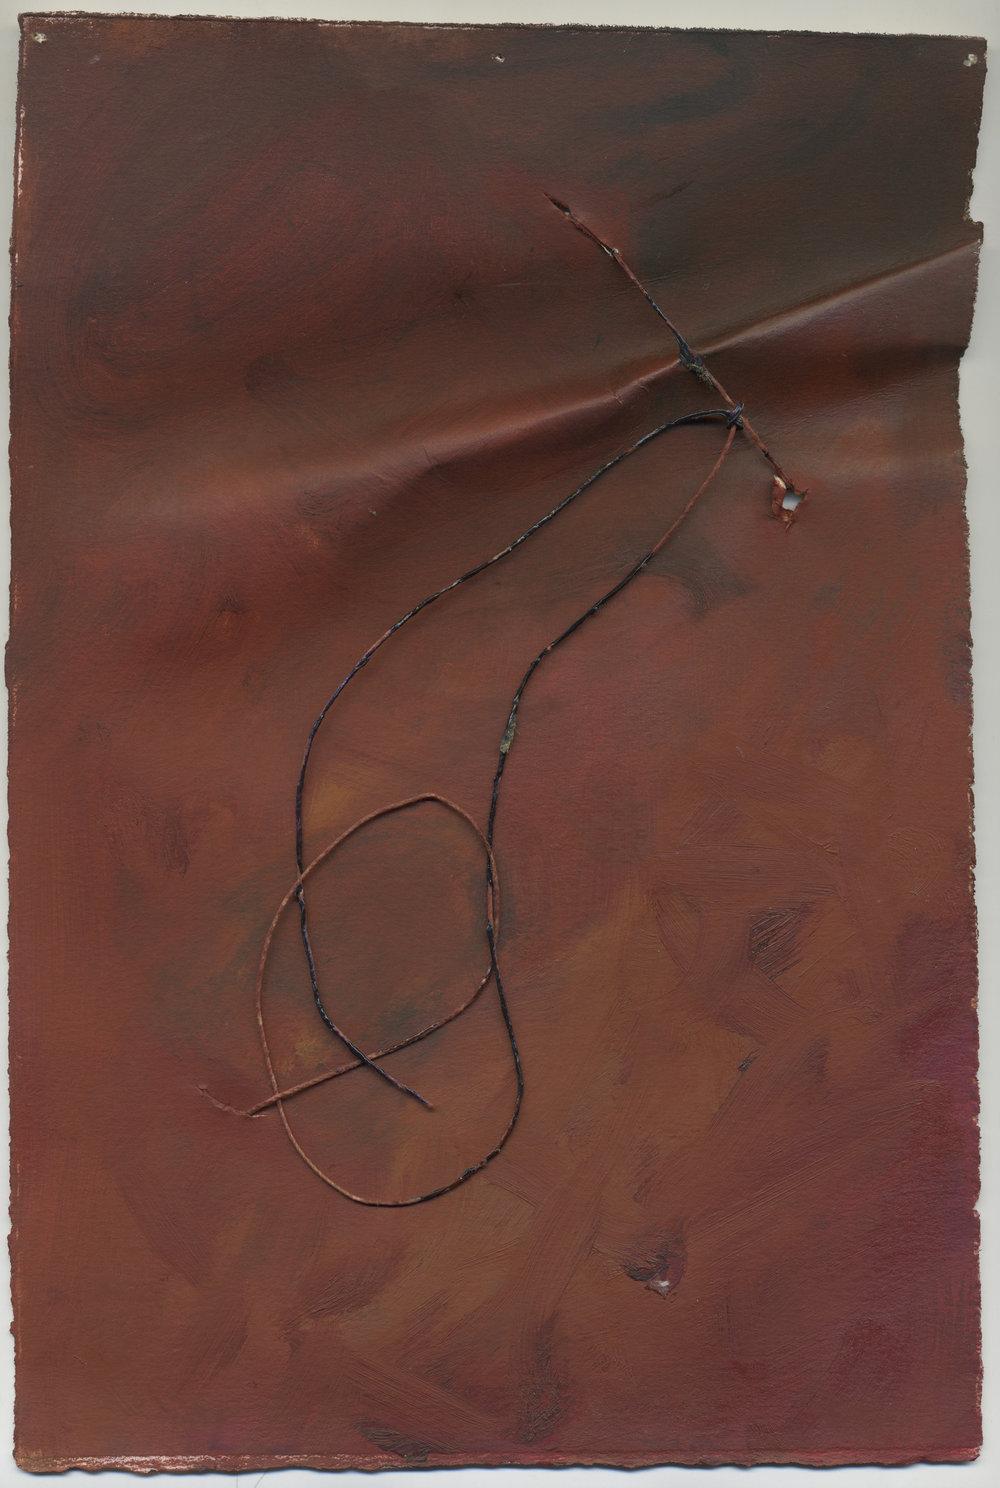 Artemis-study_w-string-2-1985.jpg